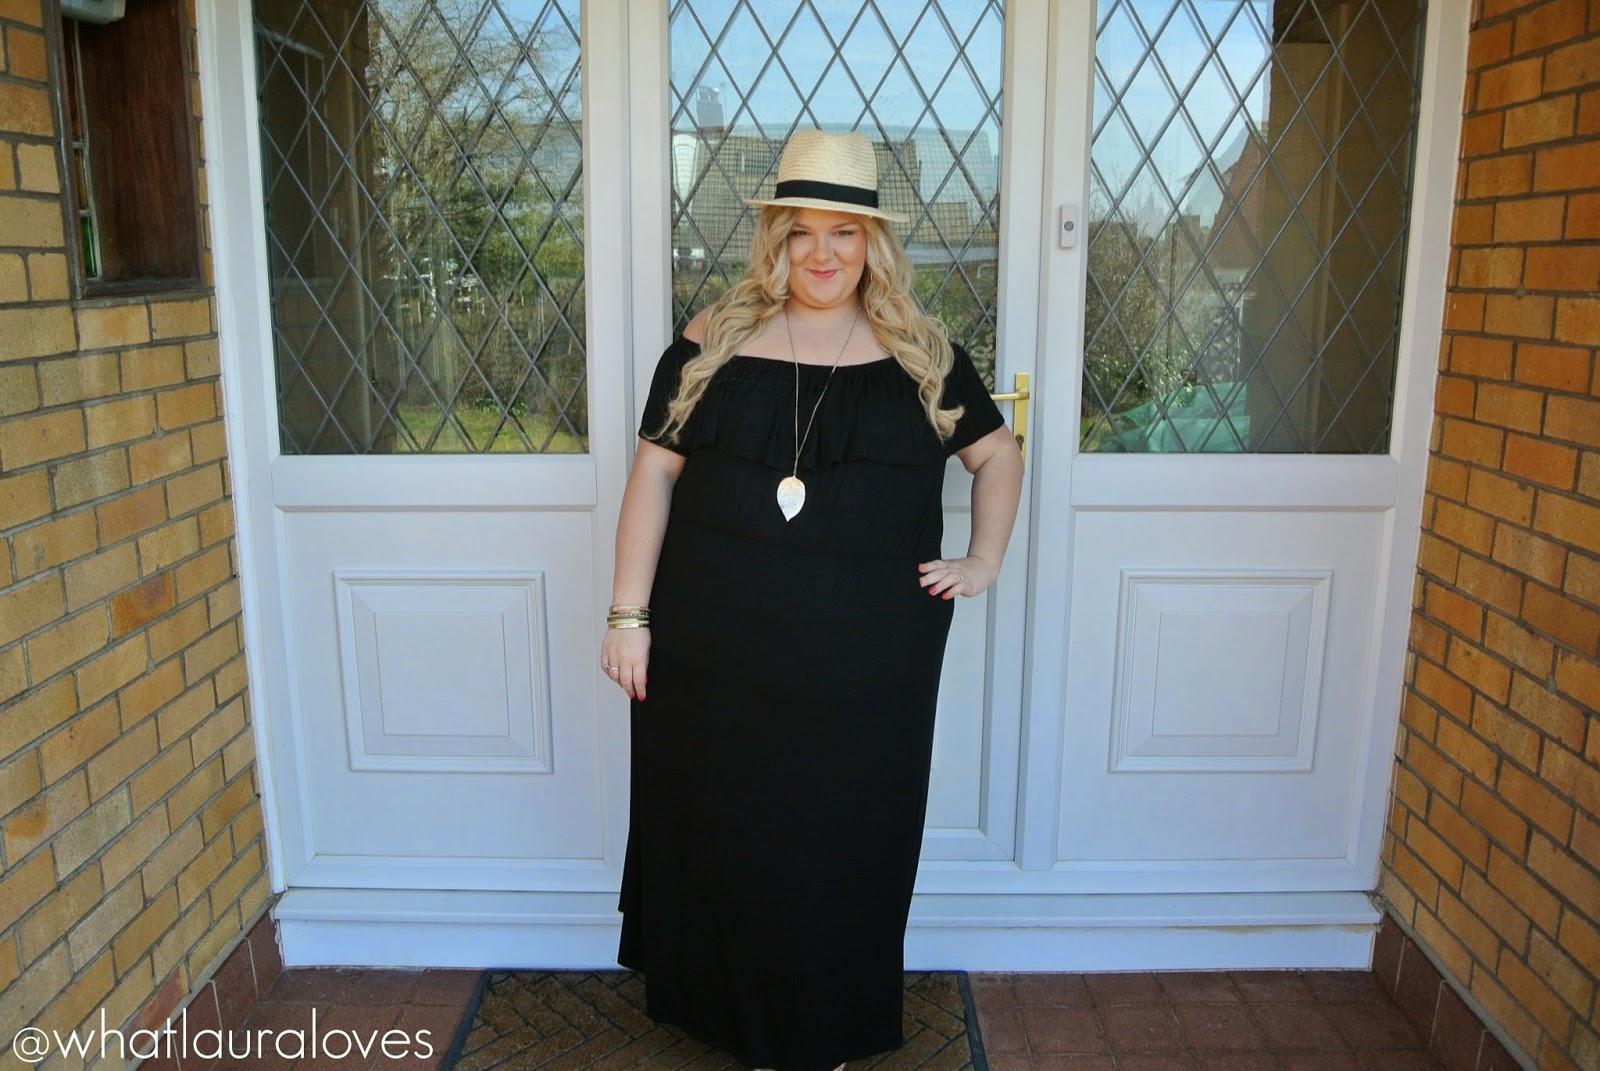 125c0d9a3c6 Plus Size Bardot Maxi Dress Straw Fedora Michael Kors Sandals ...